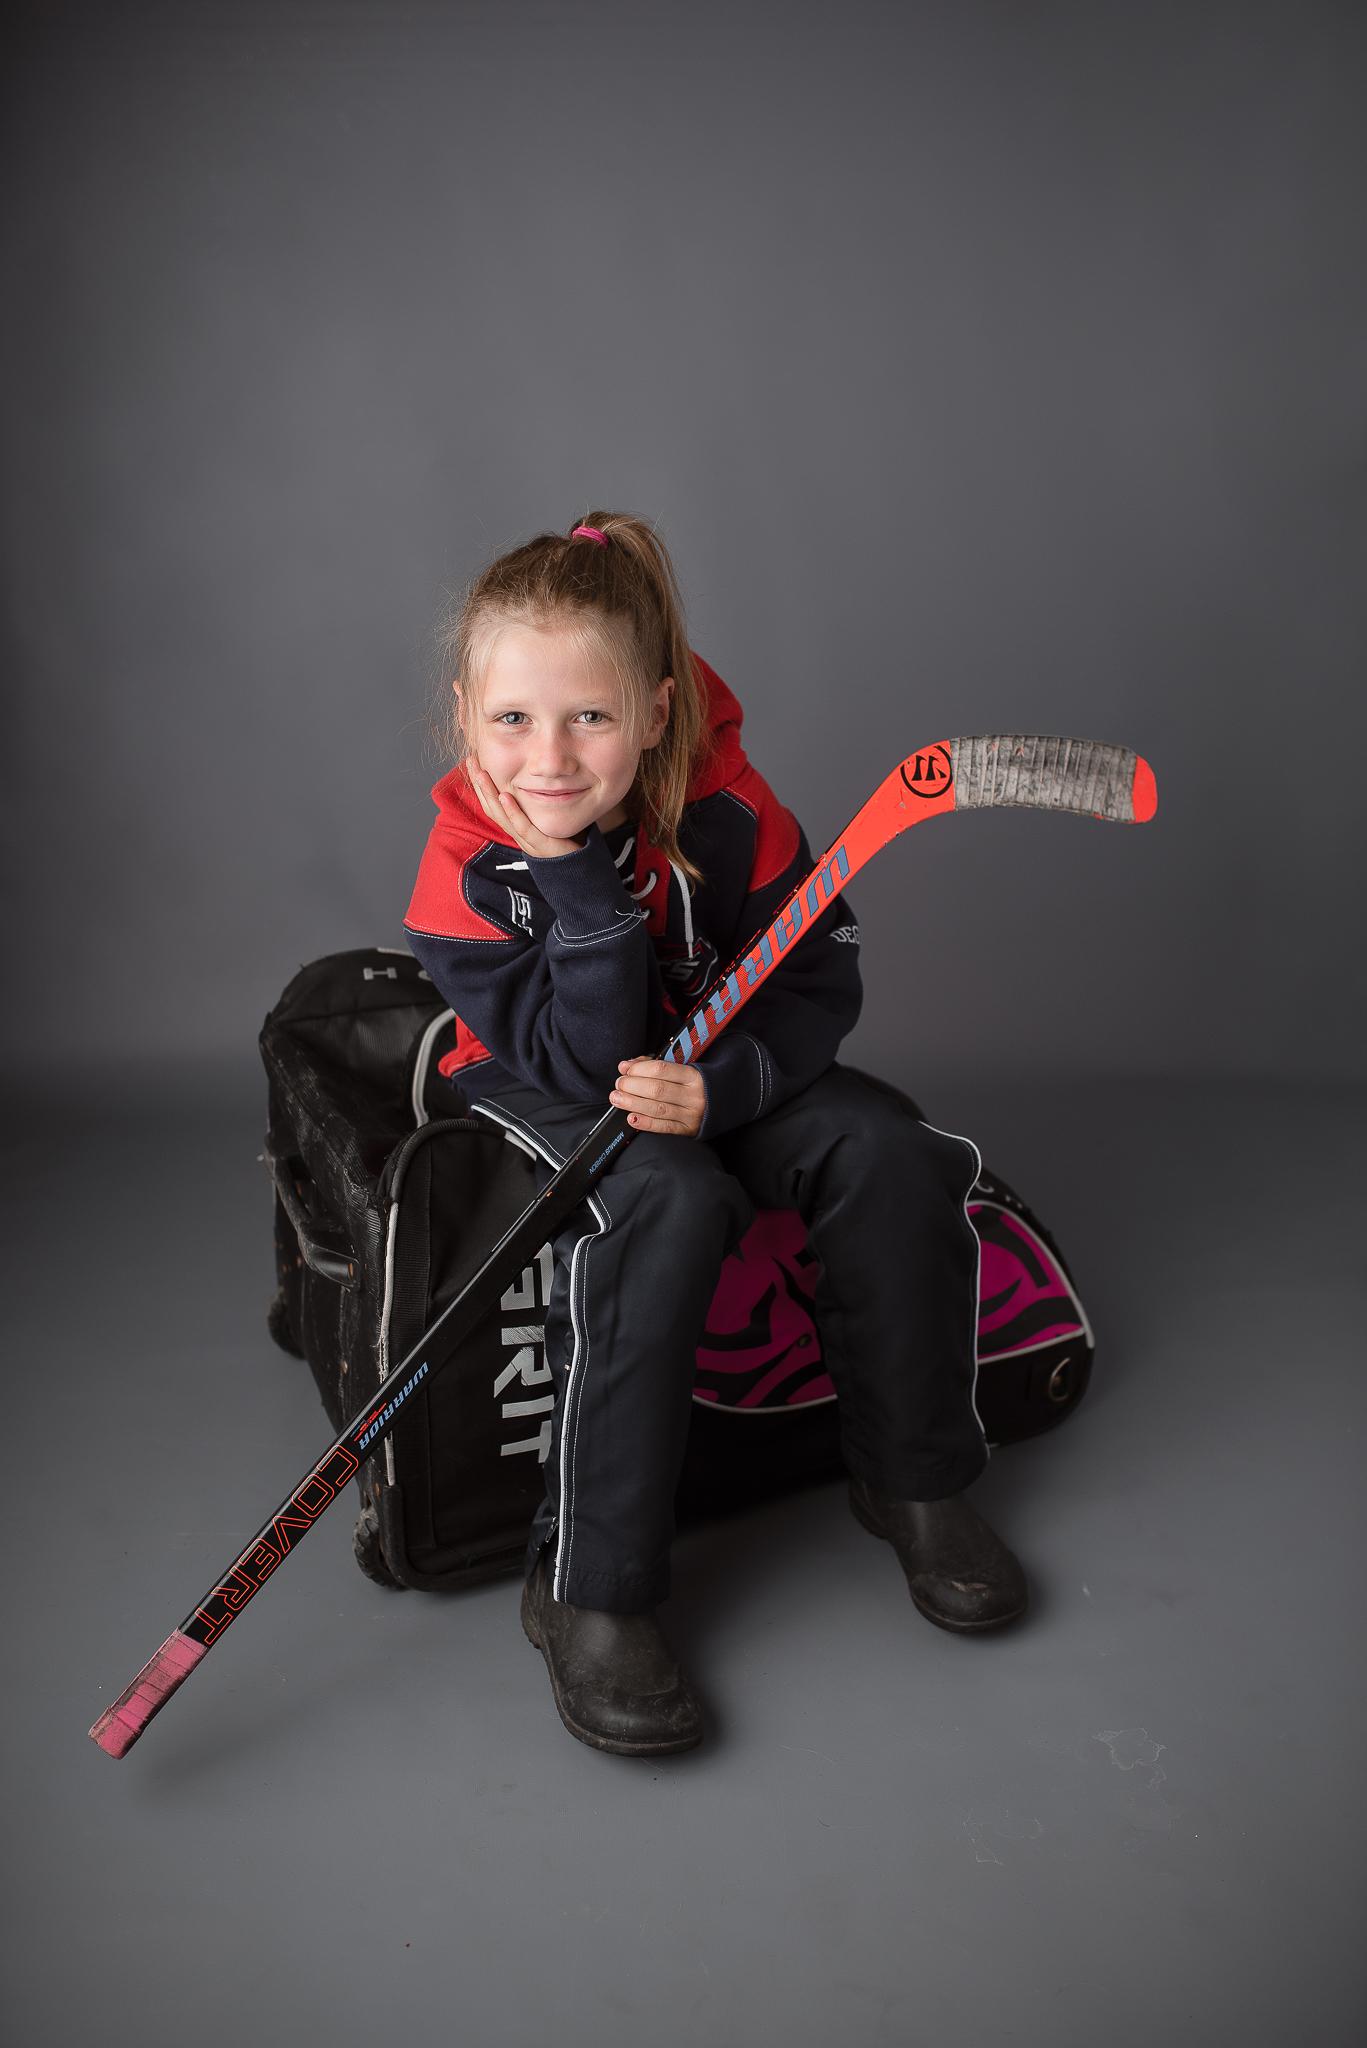 Naomi Lucienne Peterborough Photography Portrait Photography Children Photography Family Photography-14.jpg